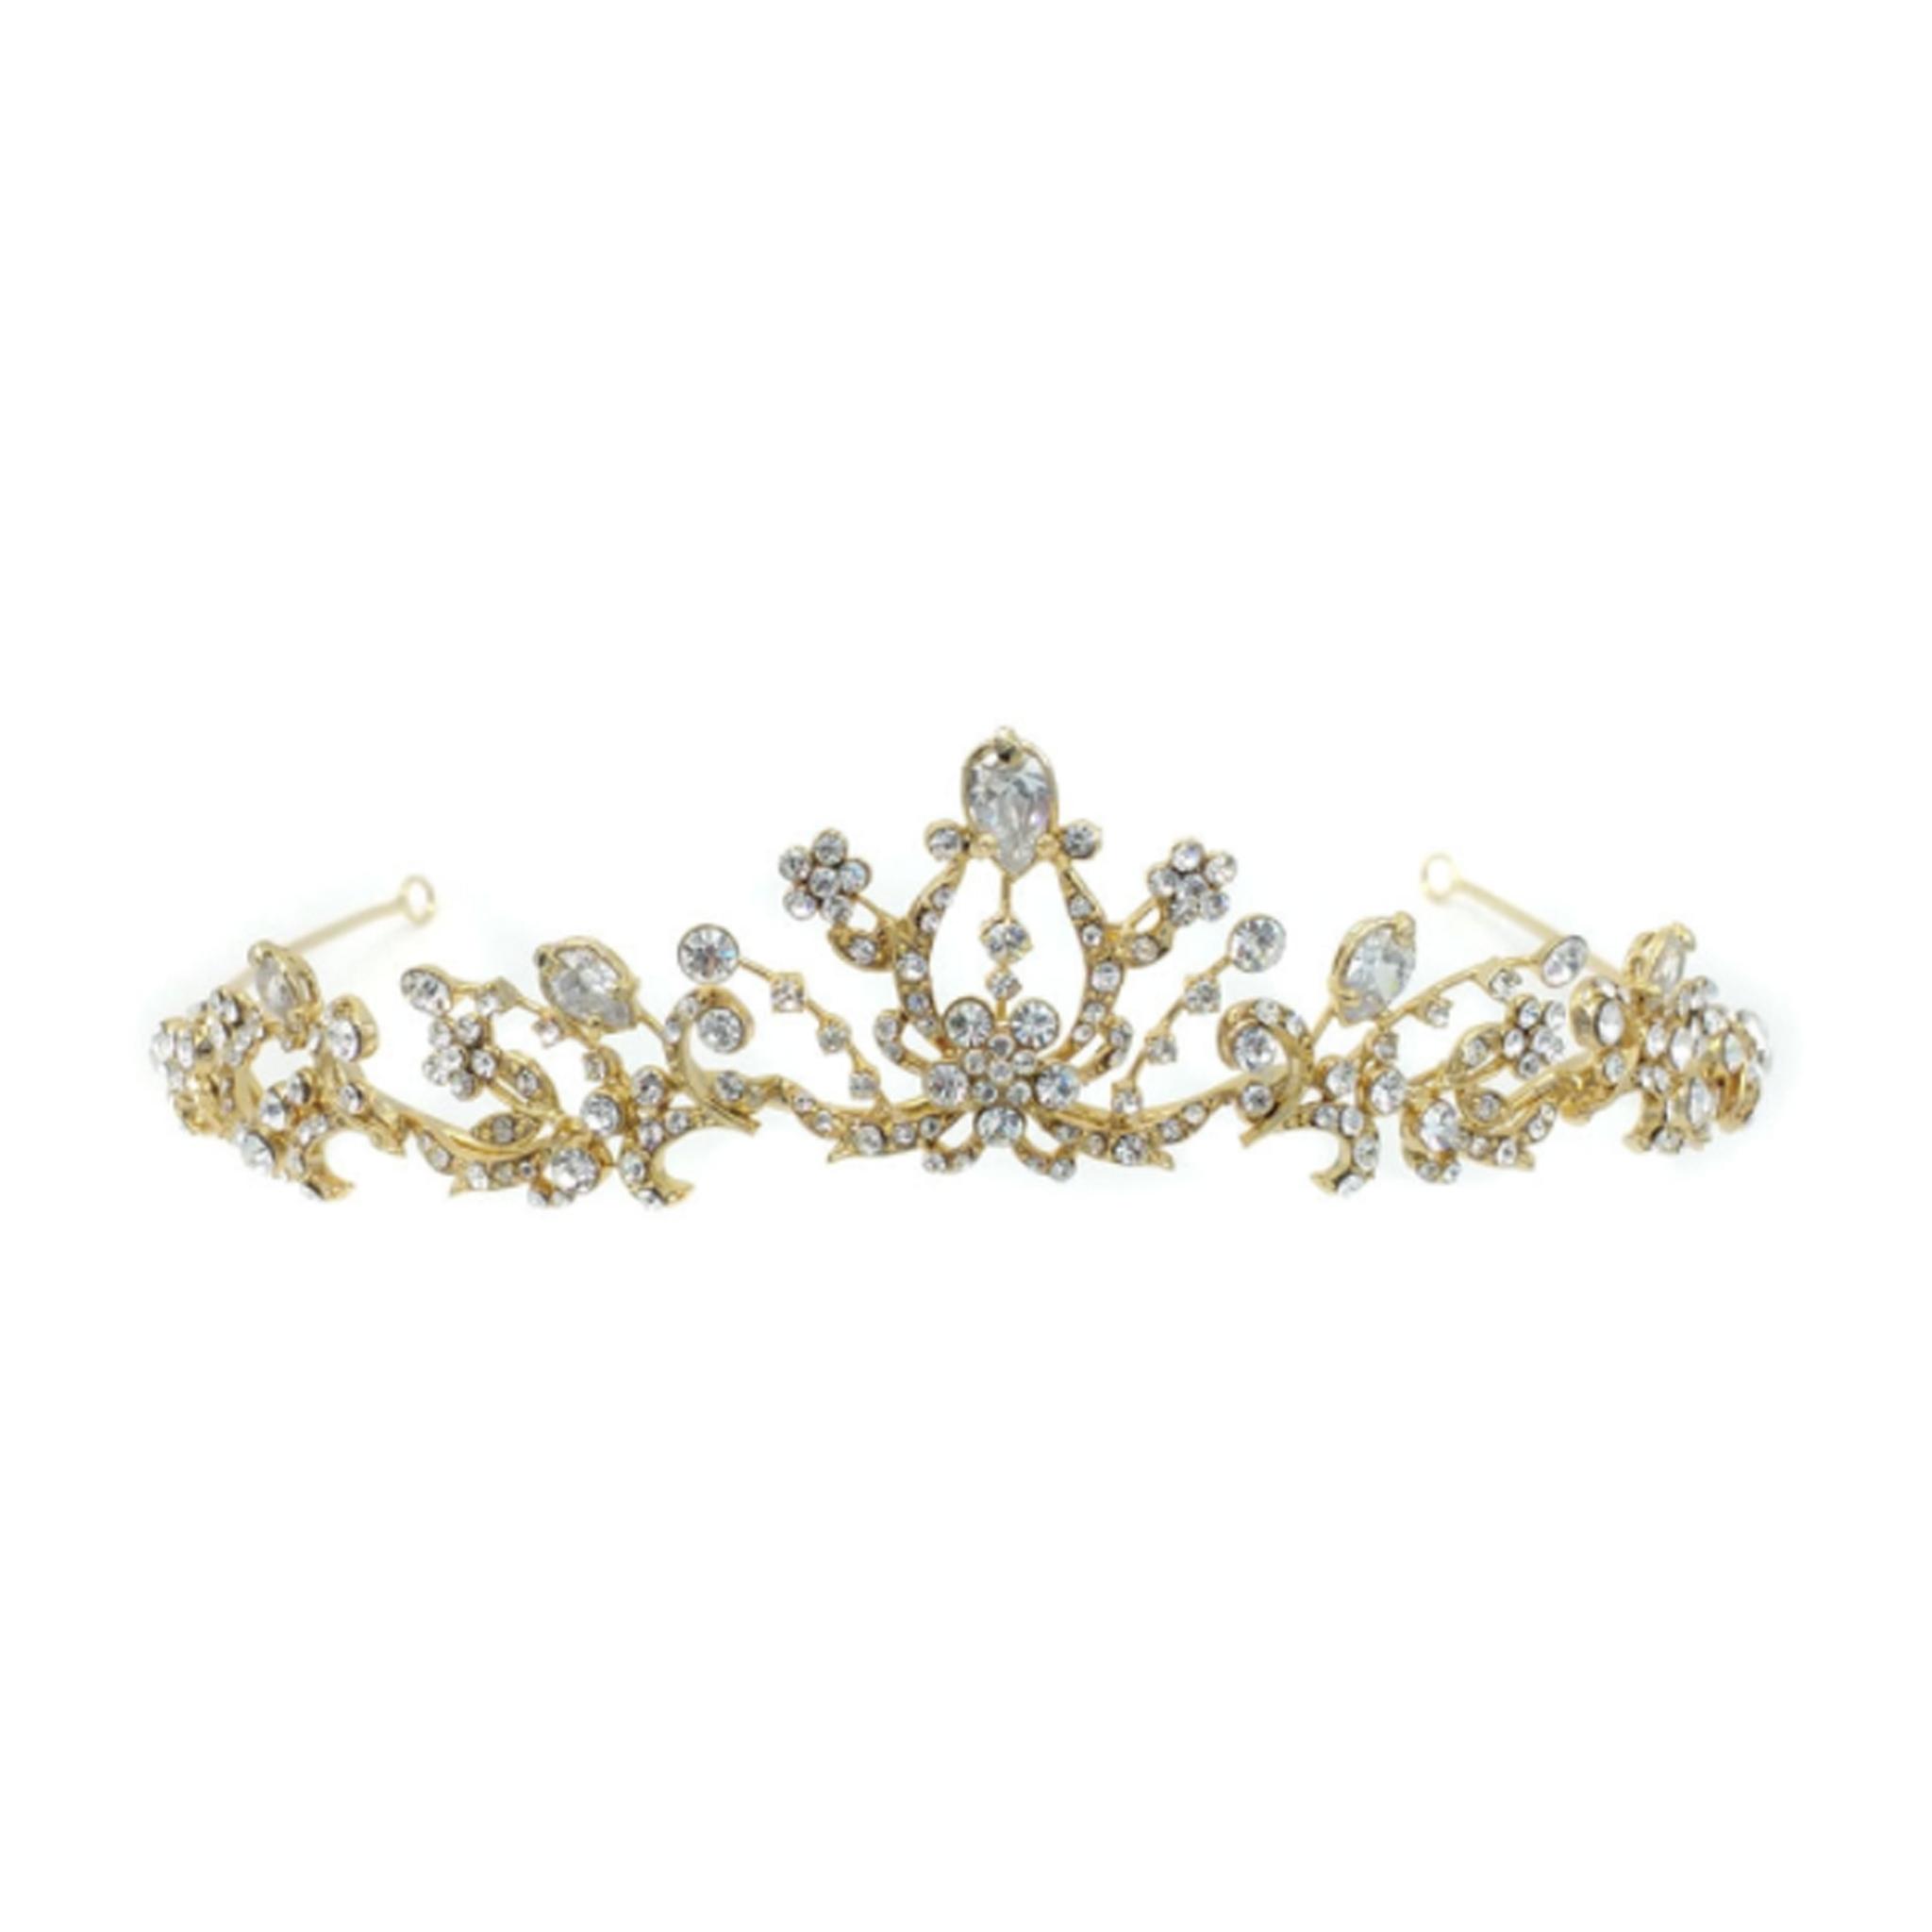 Lucetta bridal headpiece.